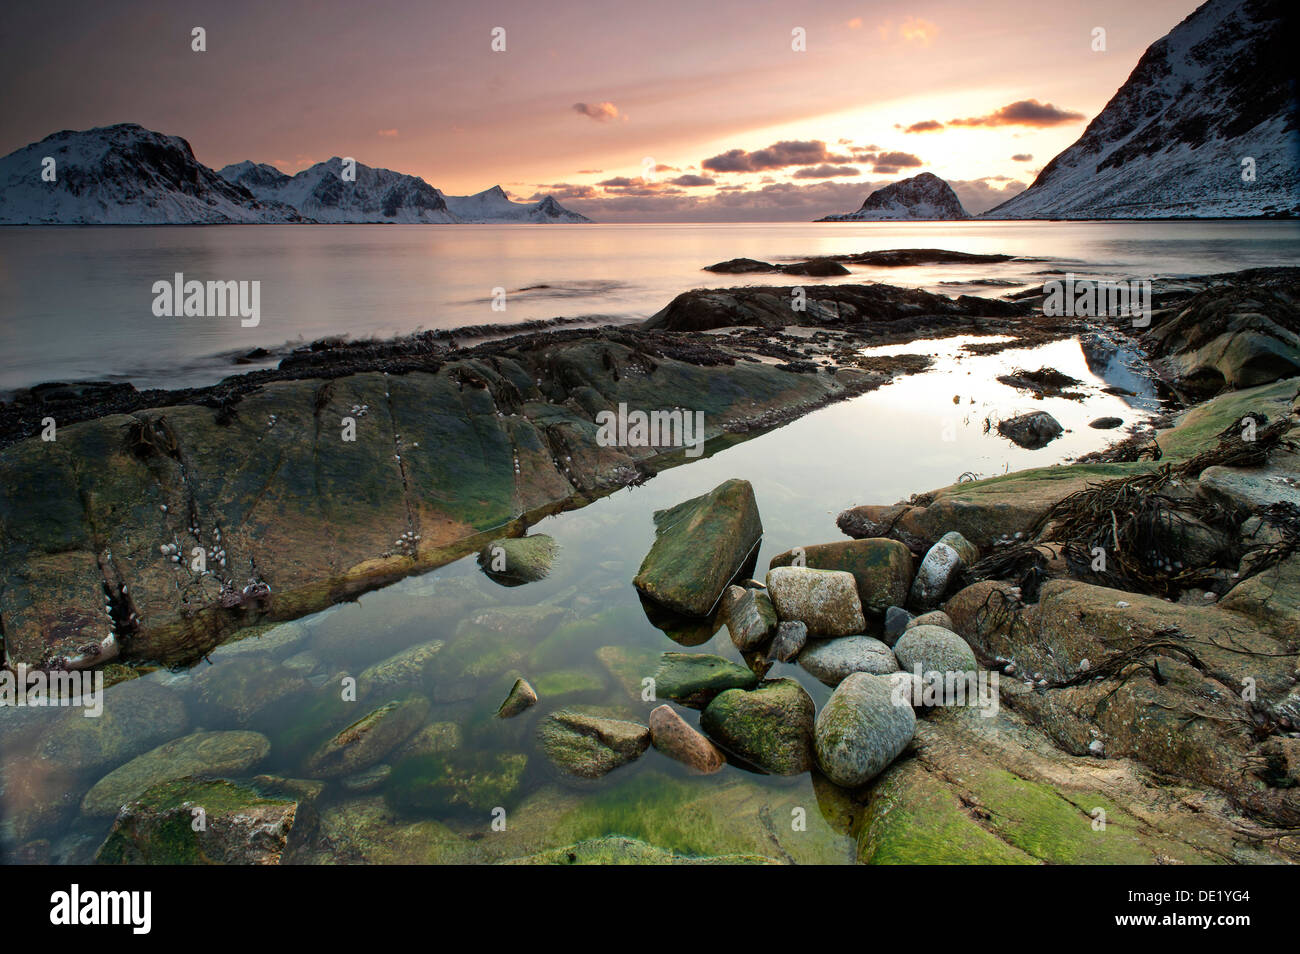 Vikbukta Bay at sunset, near Haukland, Vestvågøy, Lofoten, Nordland, Norway - Stock Image